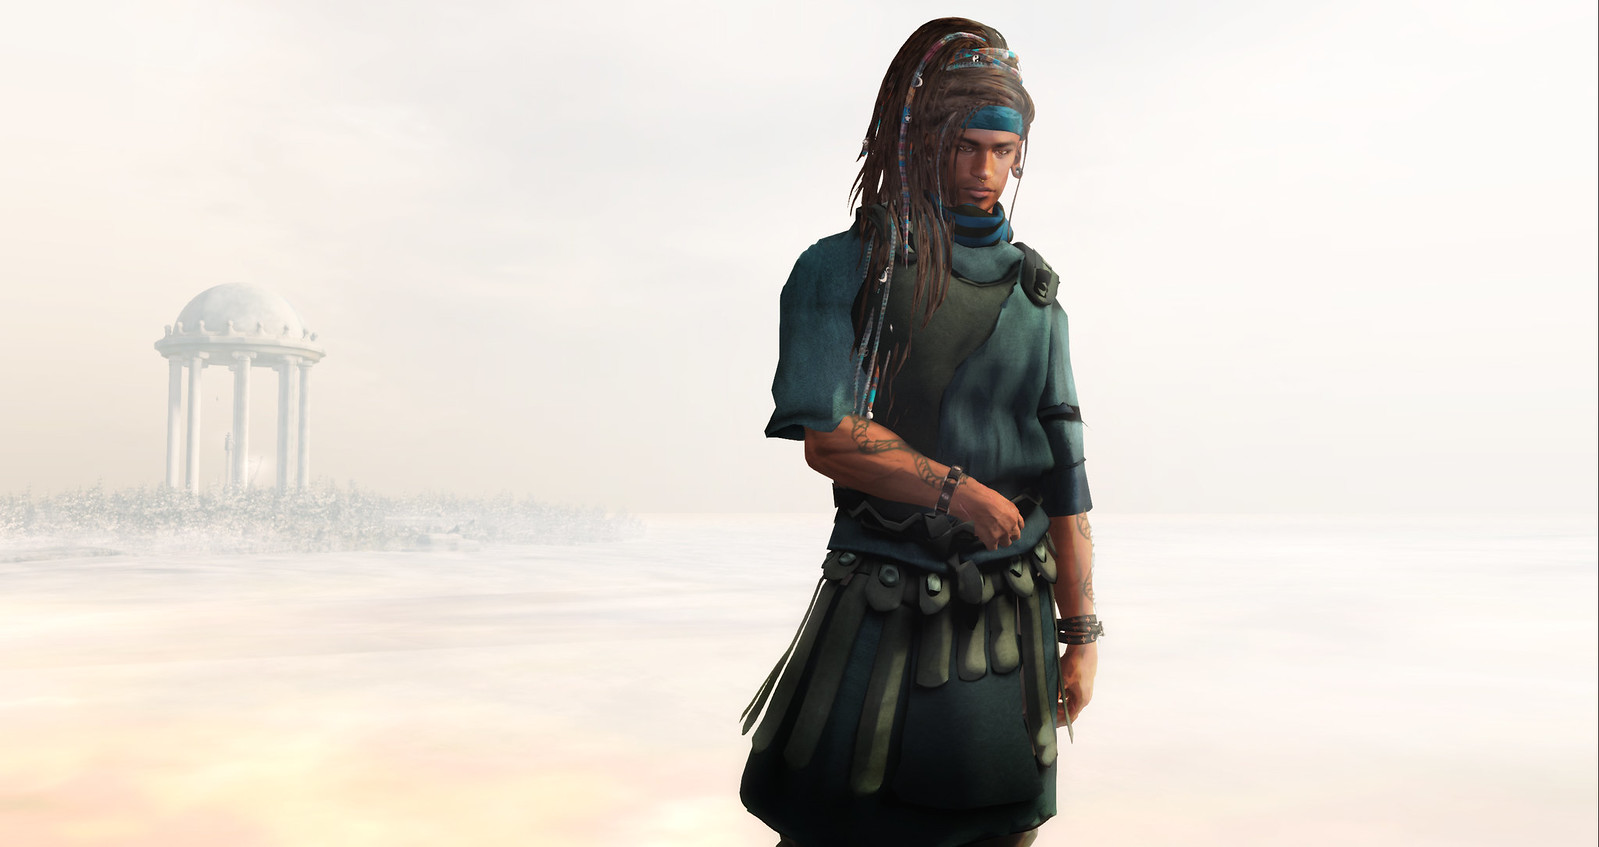 Navigator, blue caste